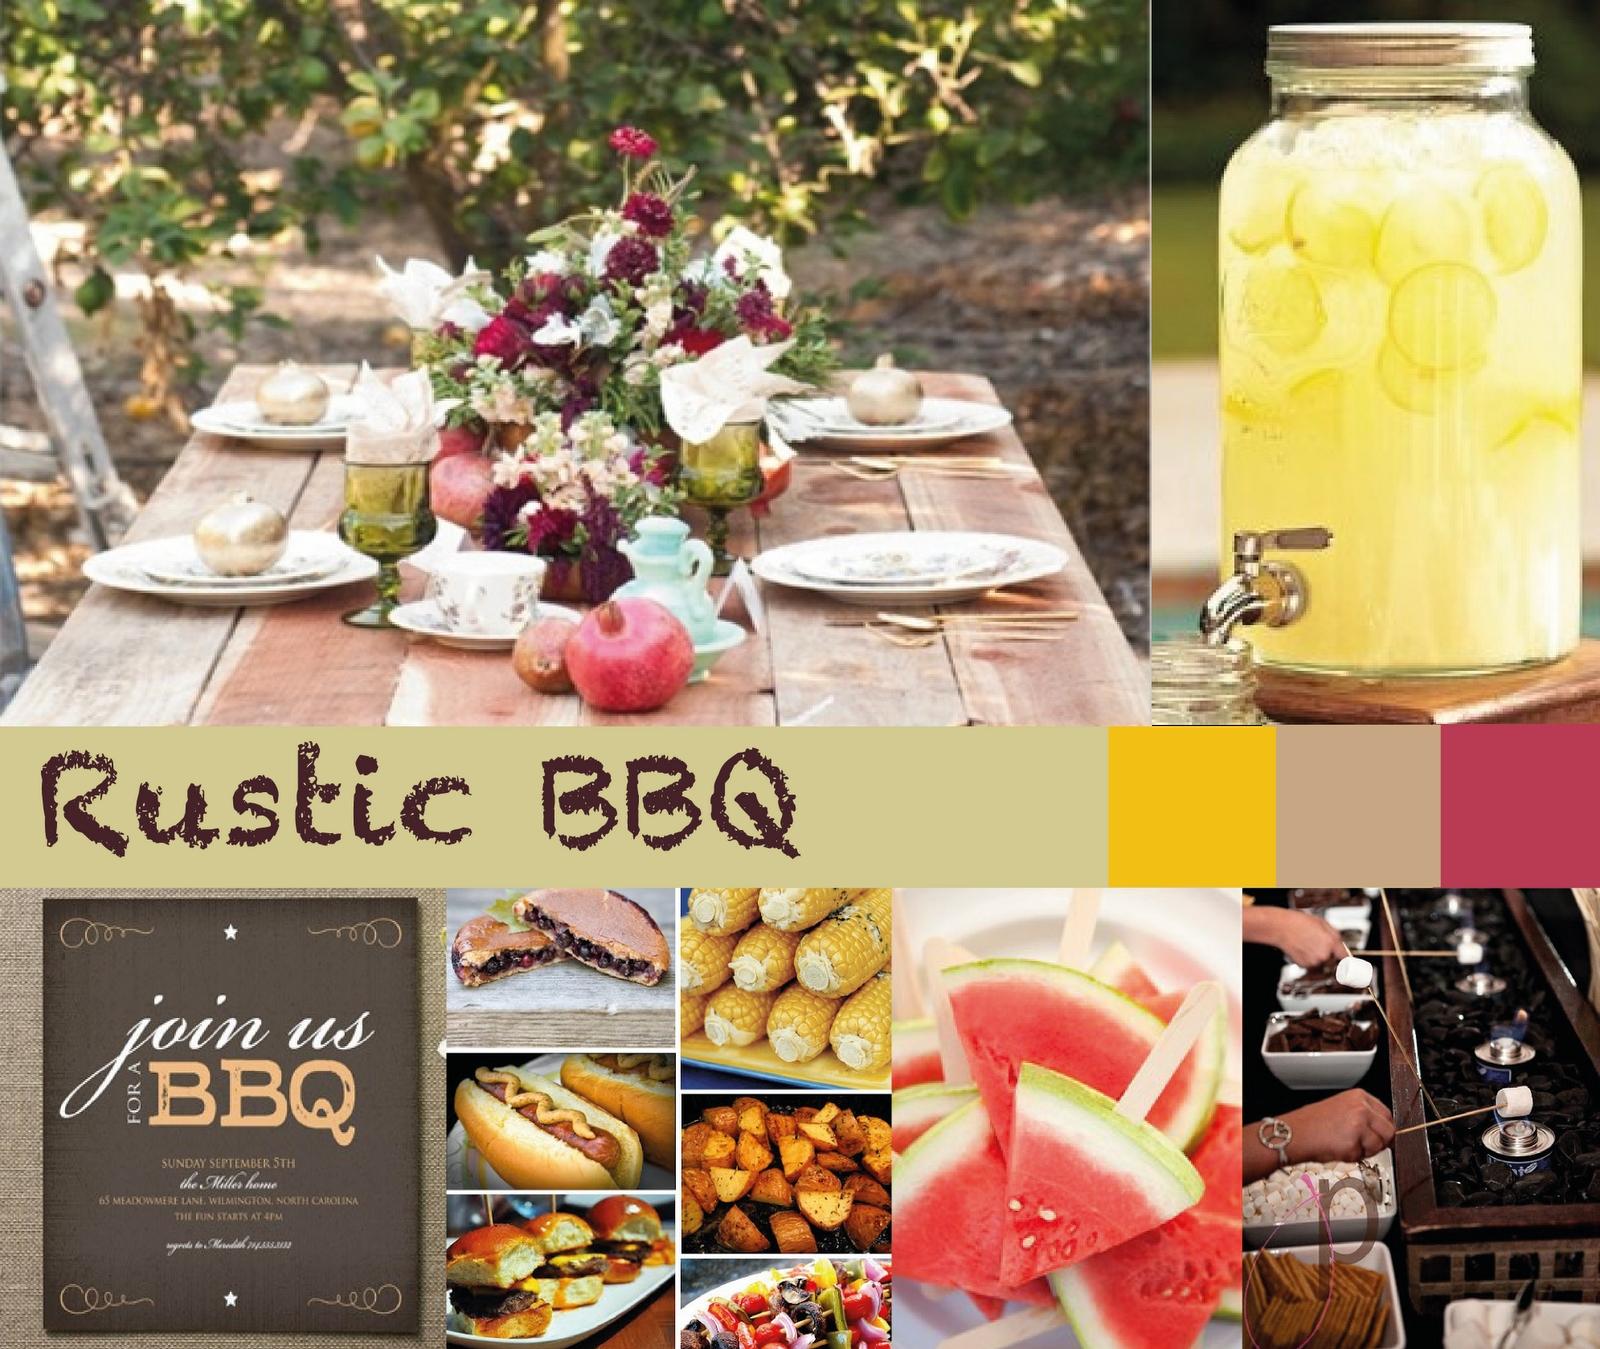 10 Fabulous Housewarming Party Ideas Martha Stewart savvy blog selebrating lifes special moments summer party 2 2020